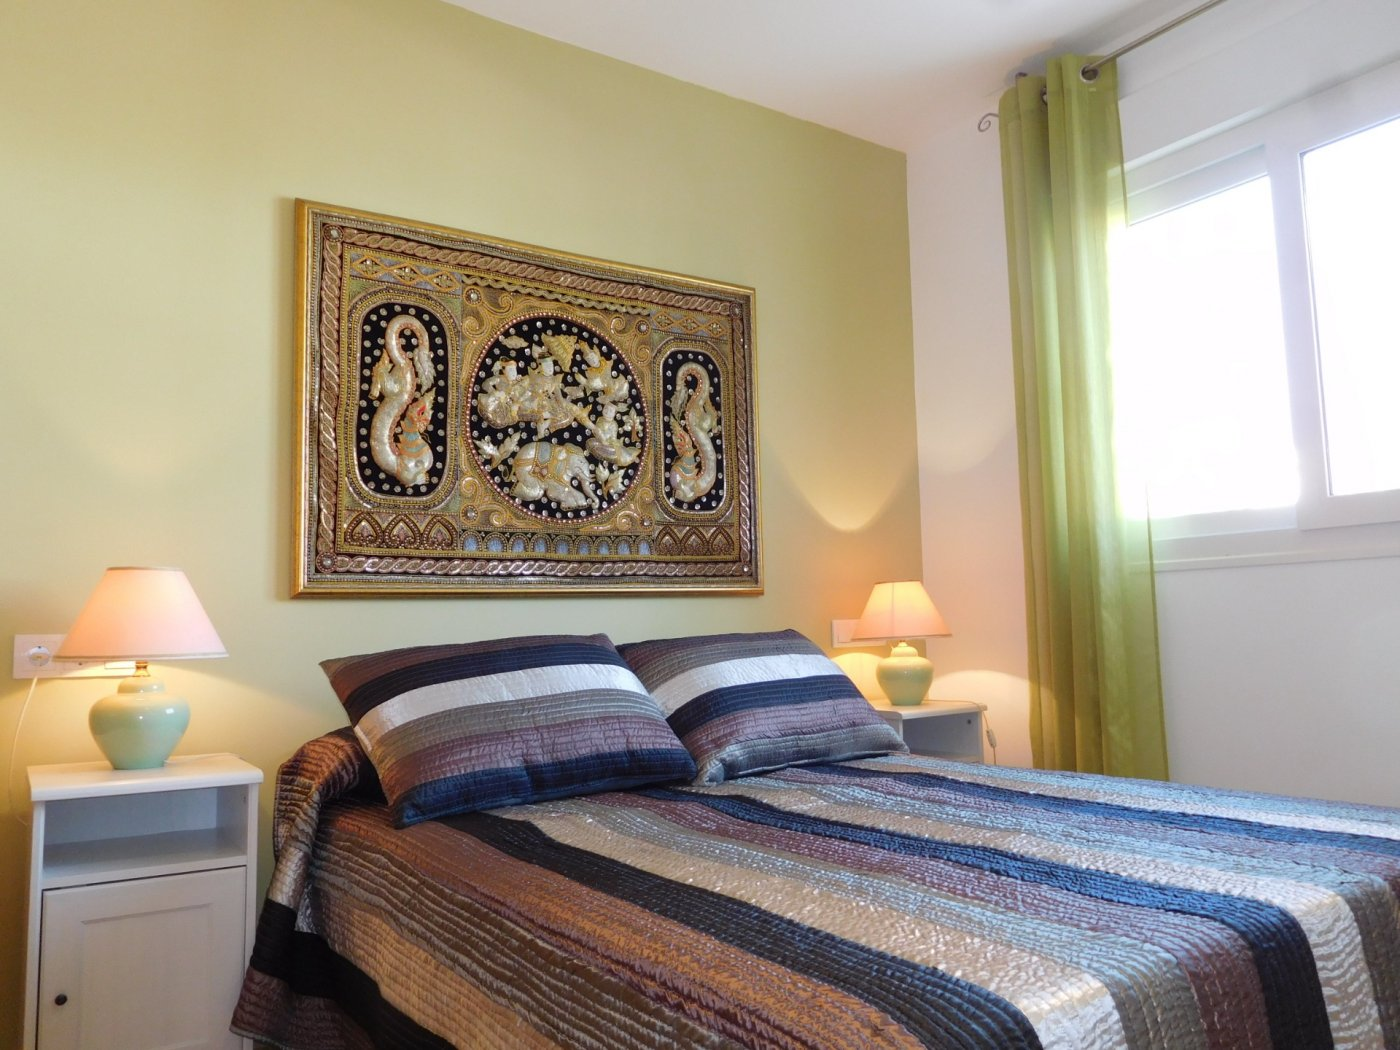 Image 3 Amarre ref 3265-03033 for rent in Condado De Alhama Spain - Quality Homes Costa Cálida